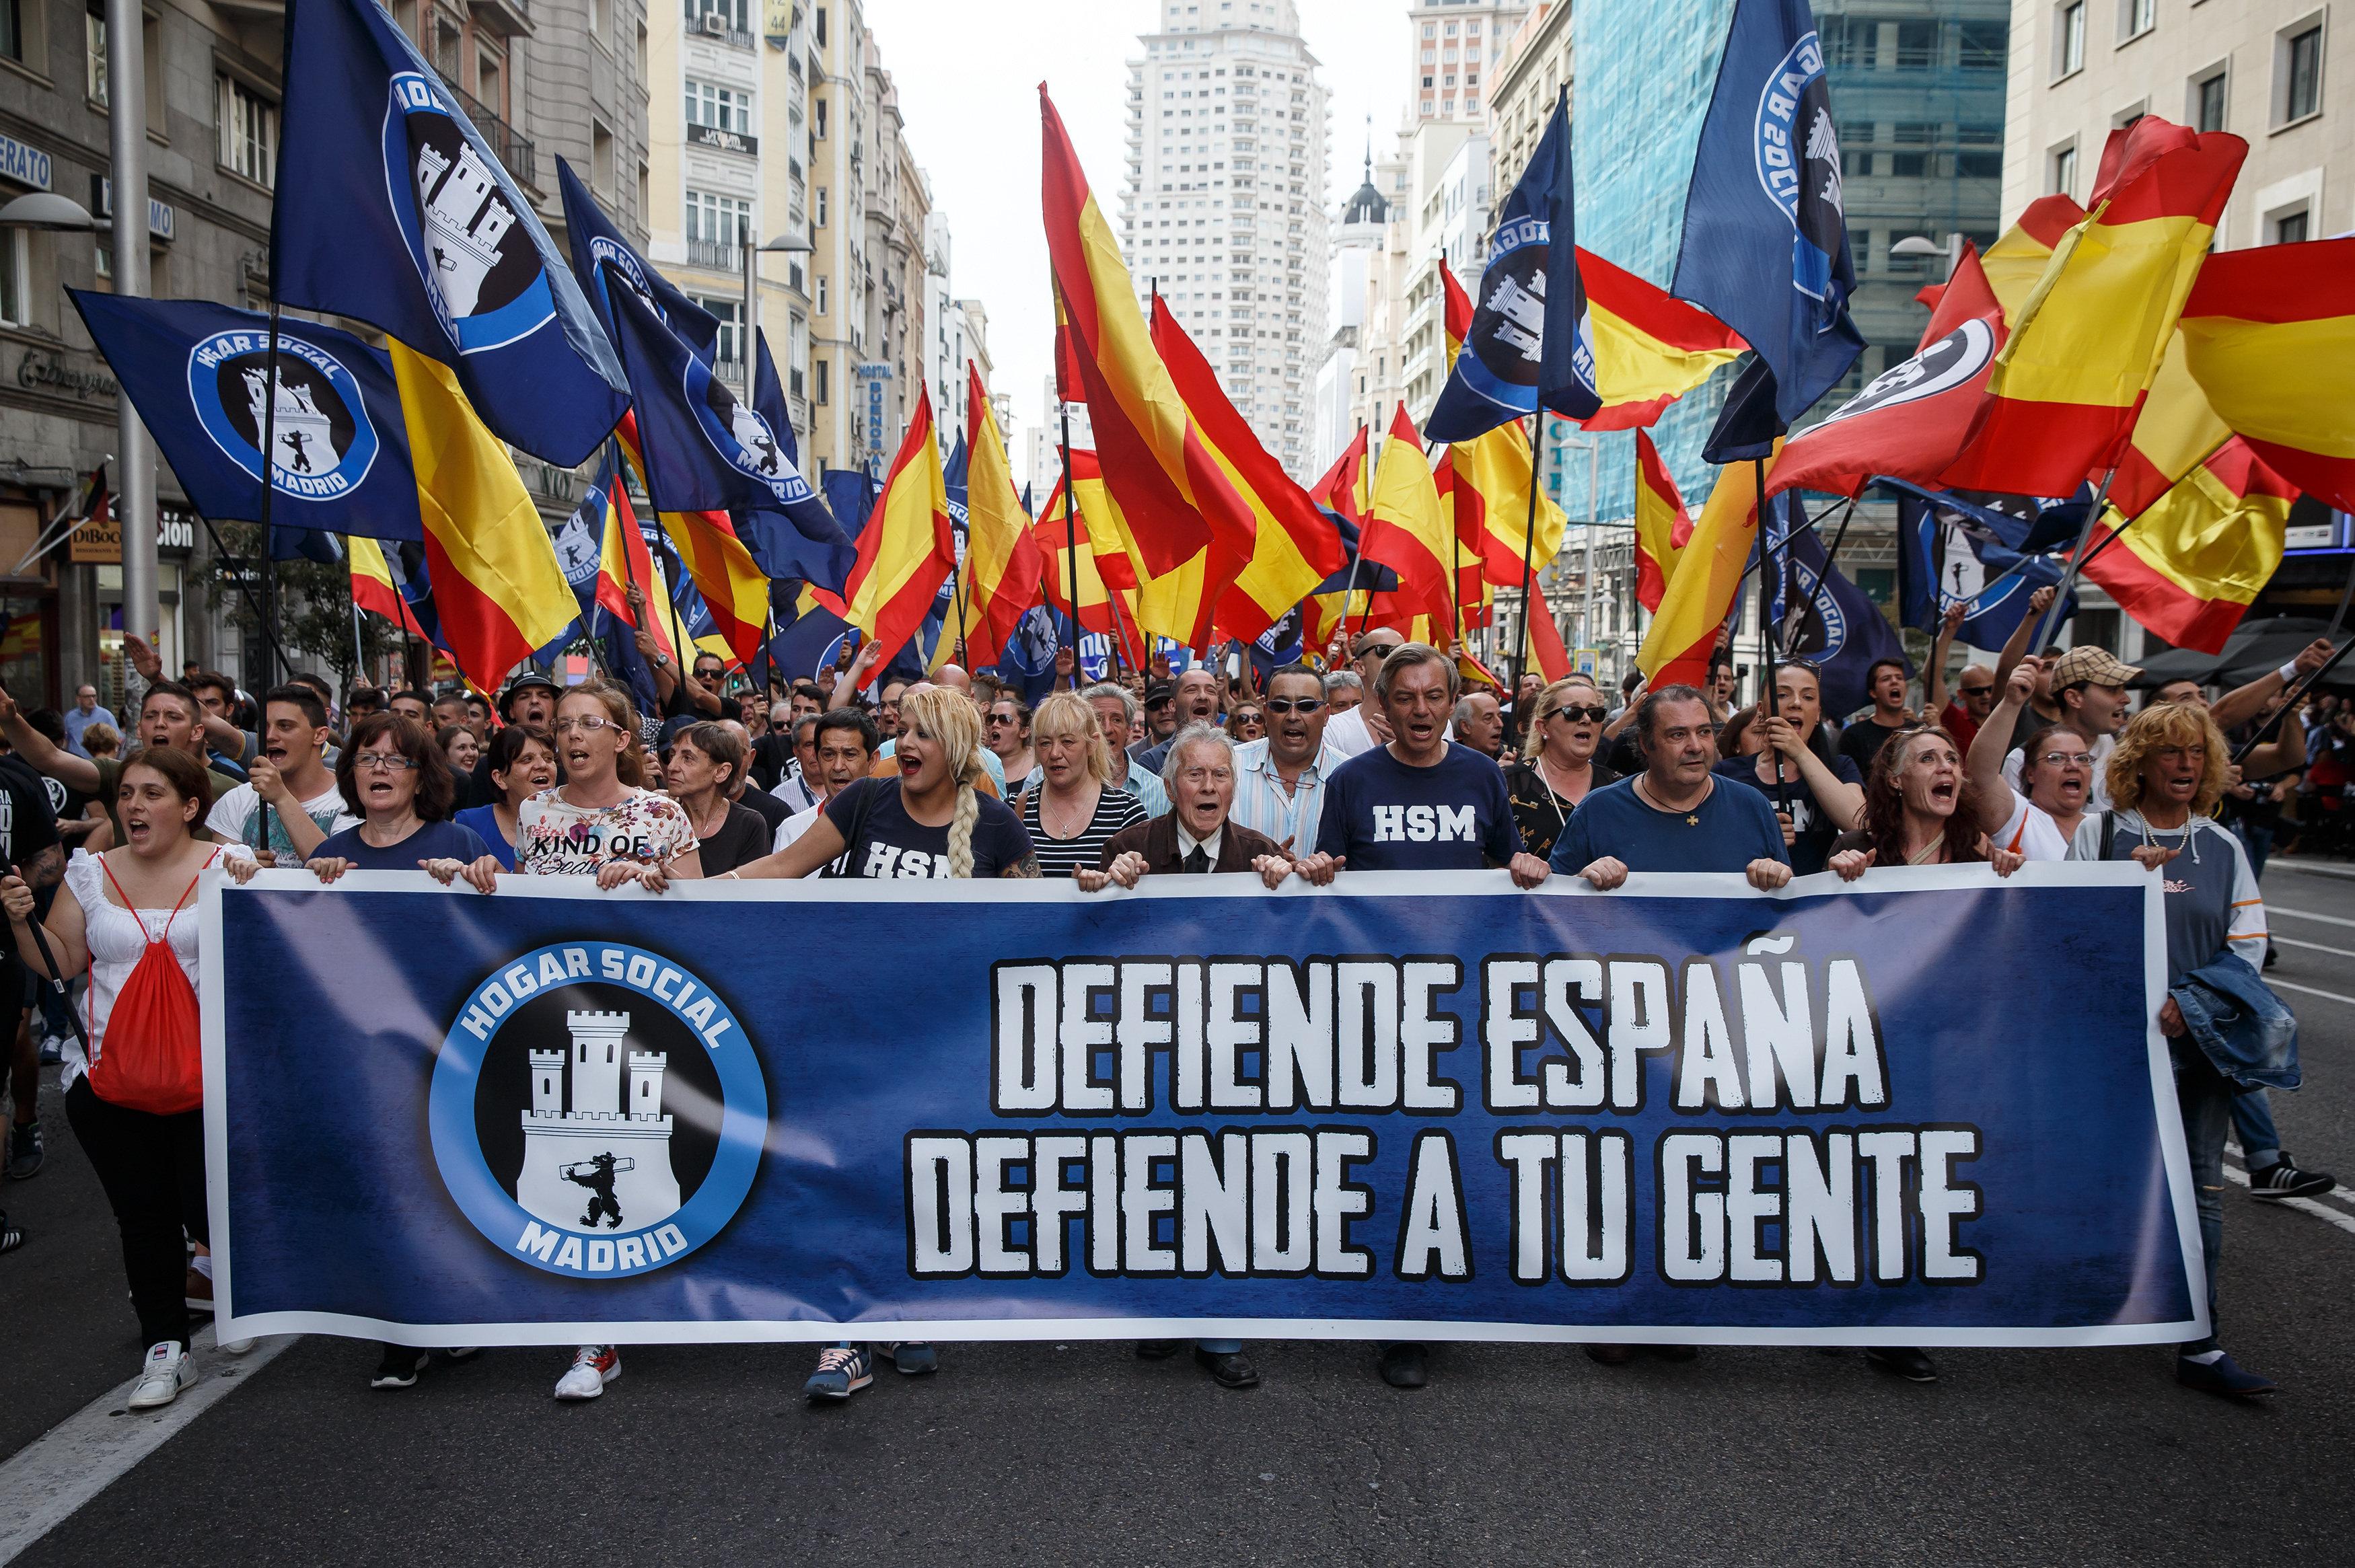 Manifestación de ultraderecha 'Hogar Social de Madrid'.